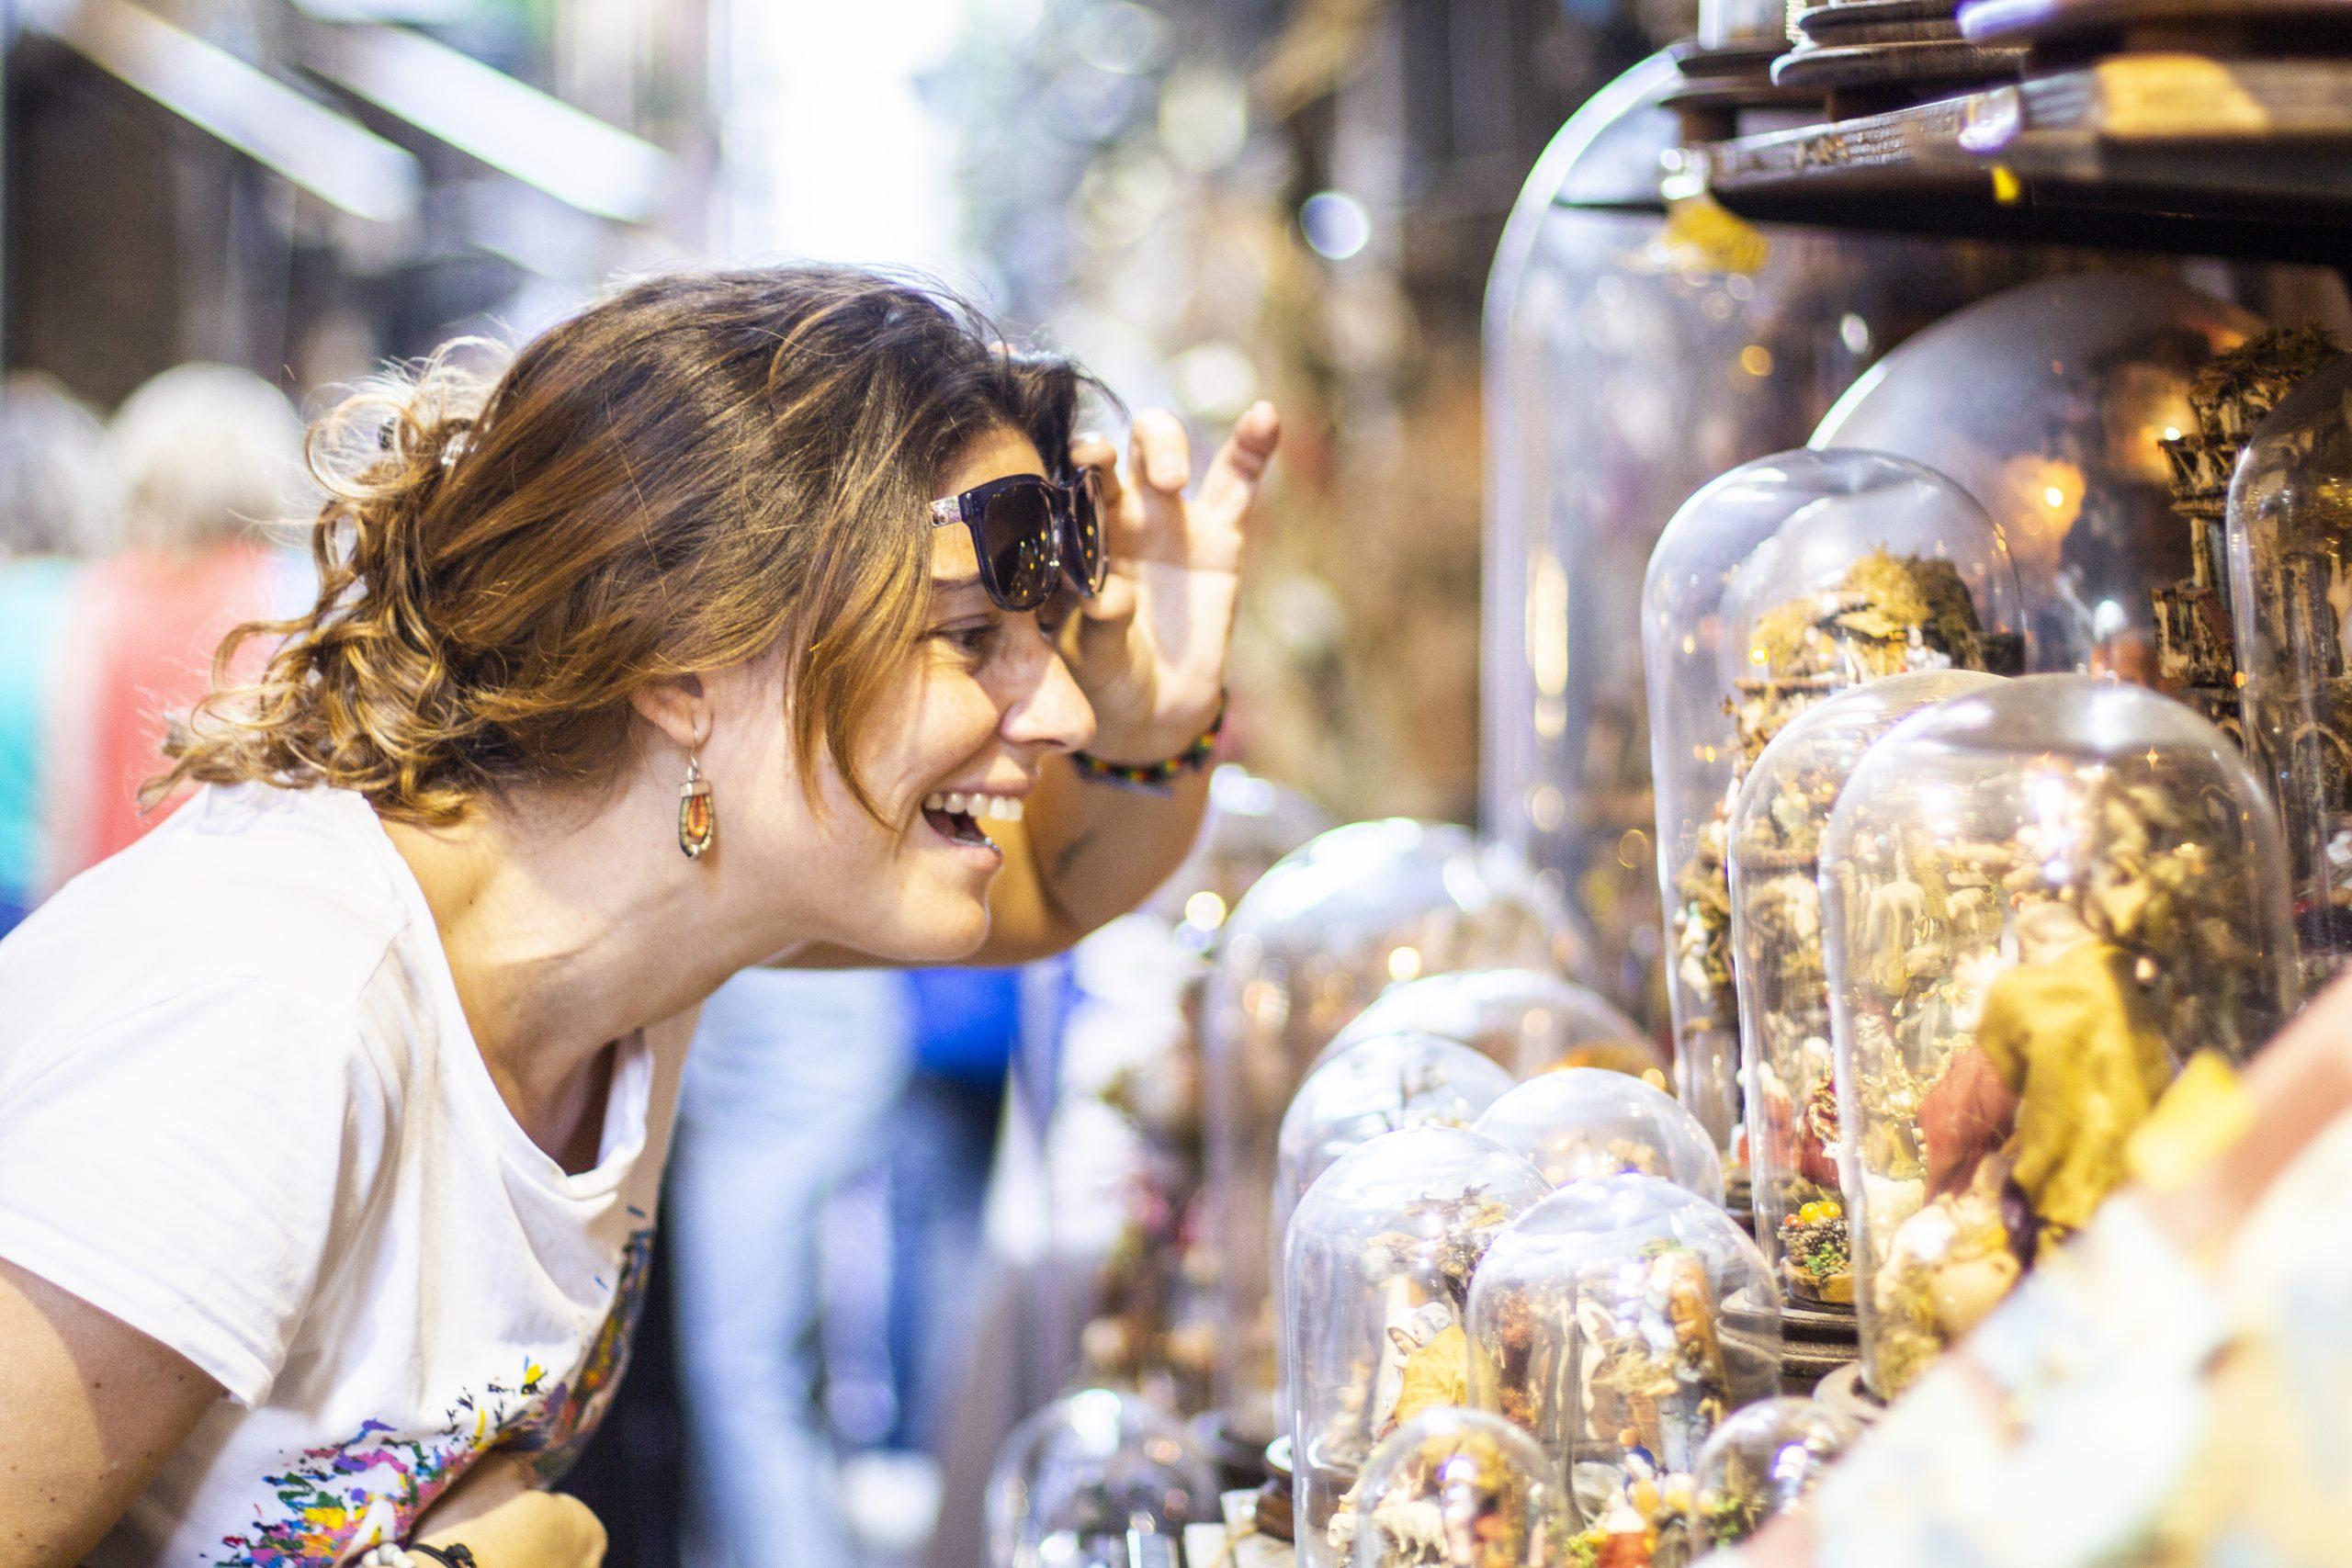 Woman Shops At Art Festival